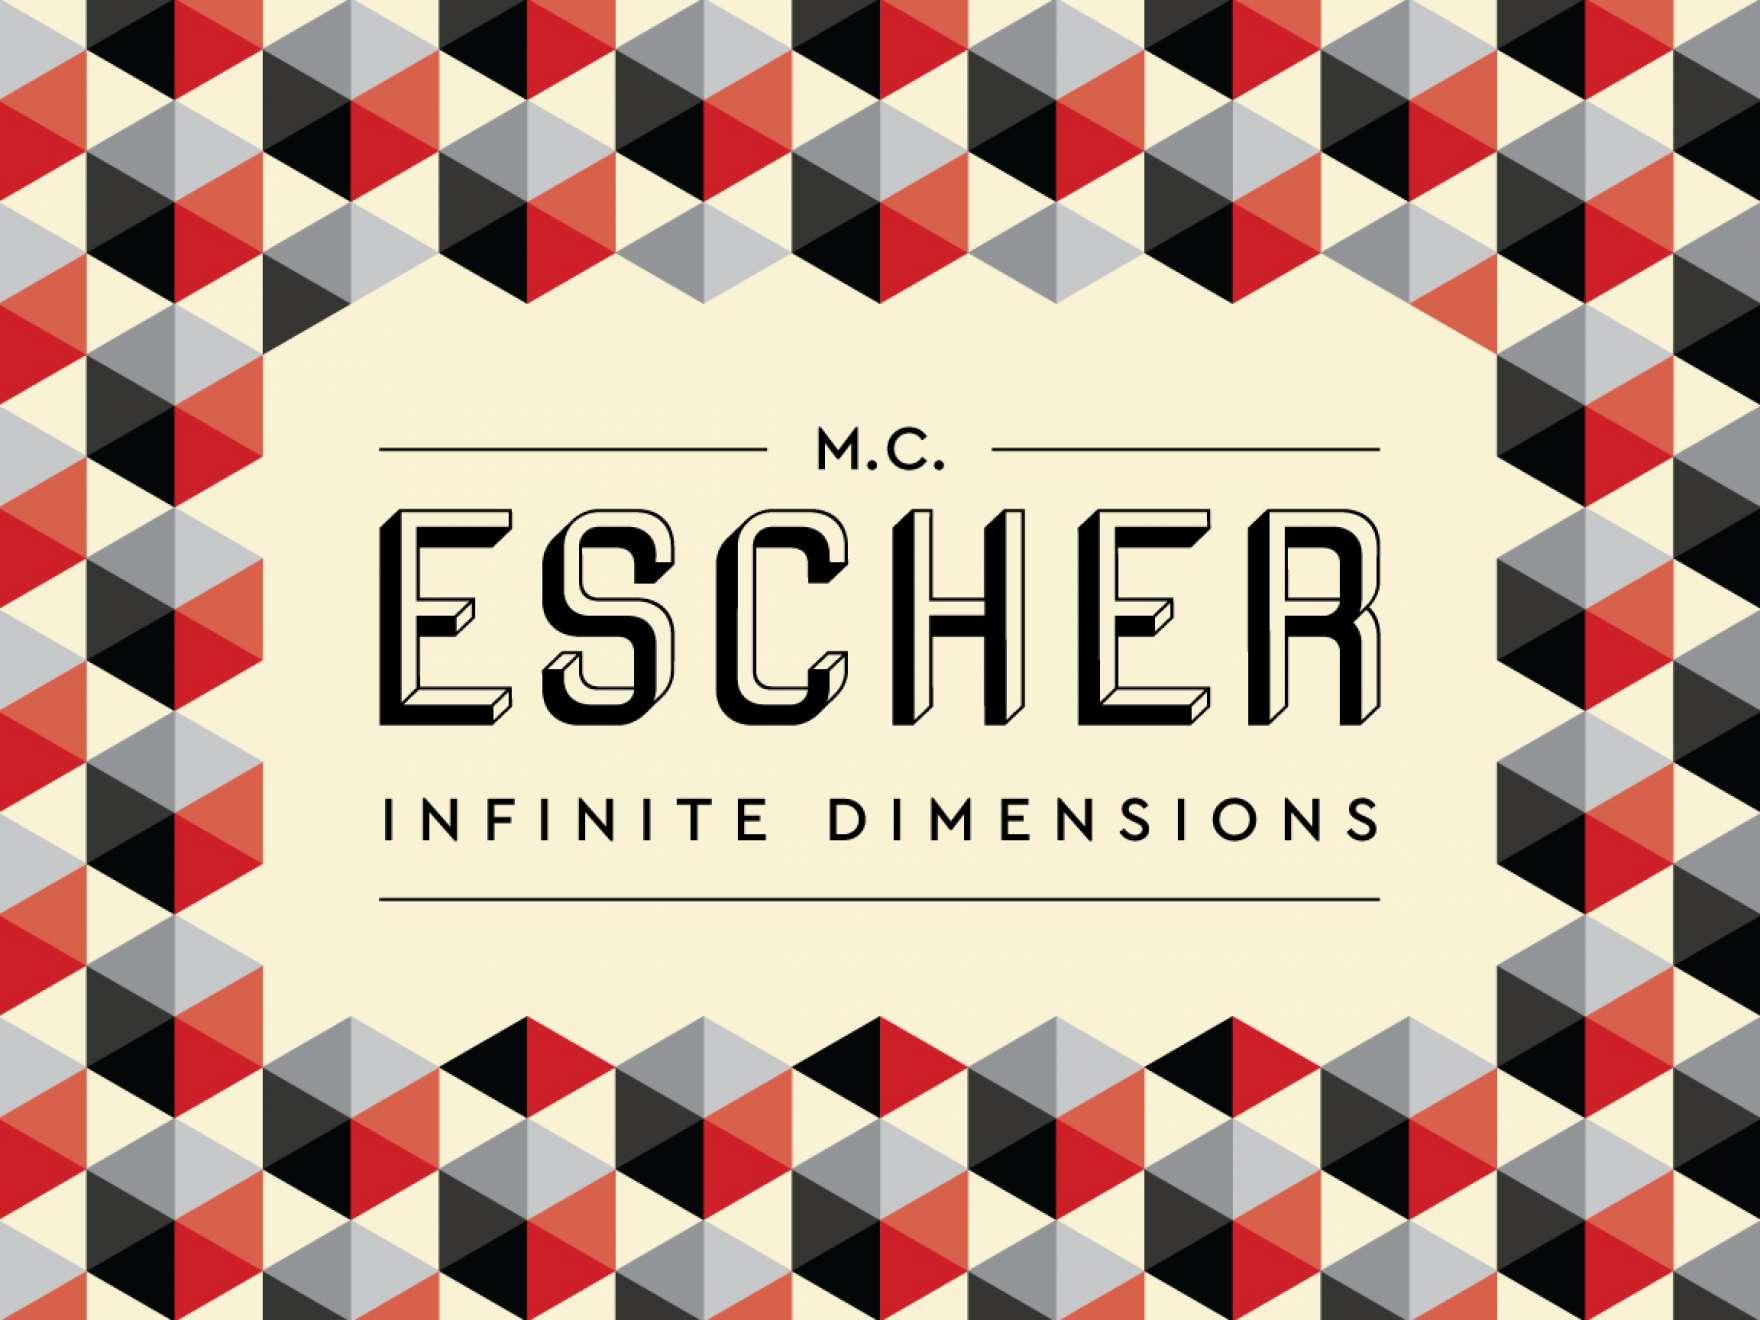 M.C. Escher: Infinite Dimensions graphic